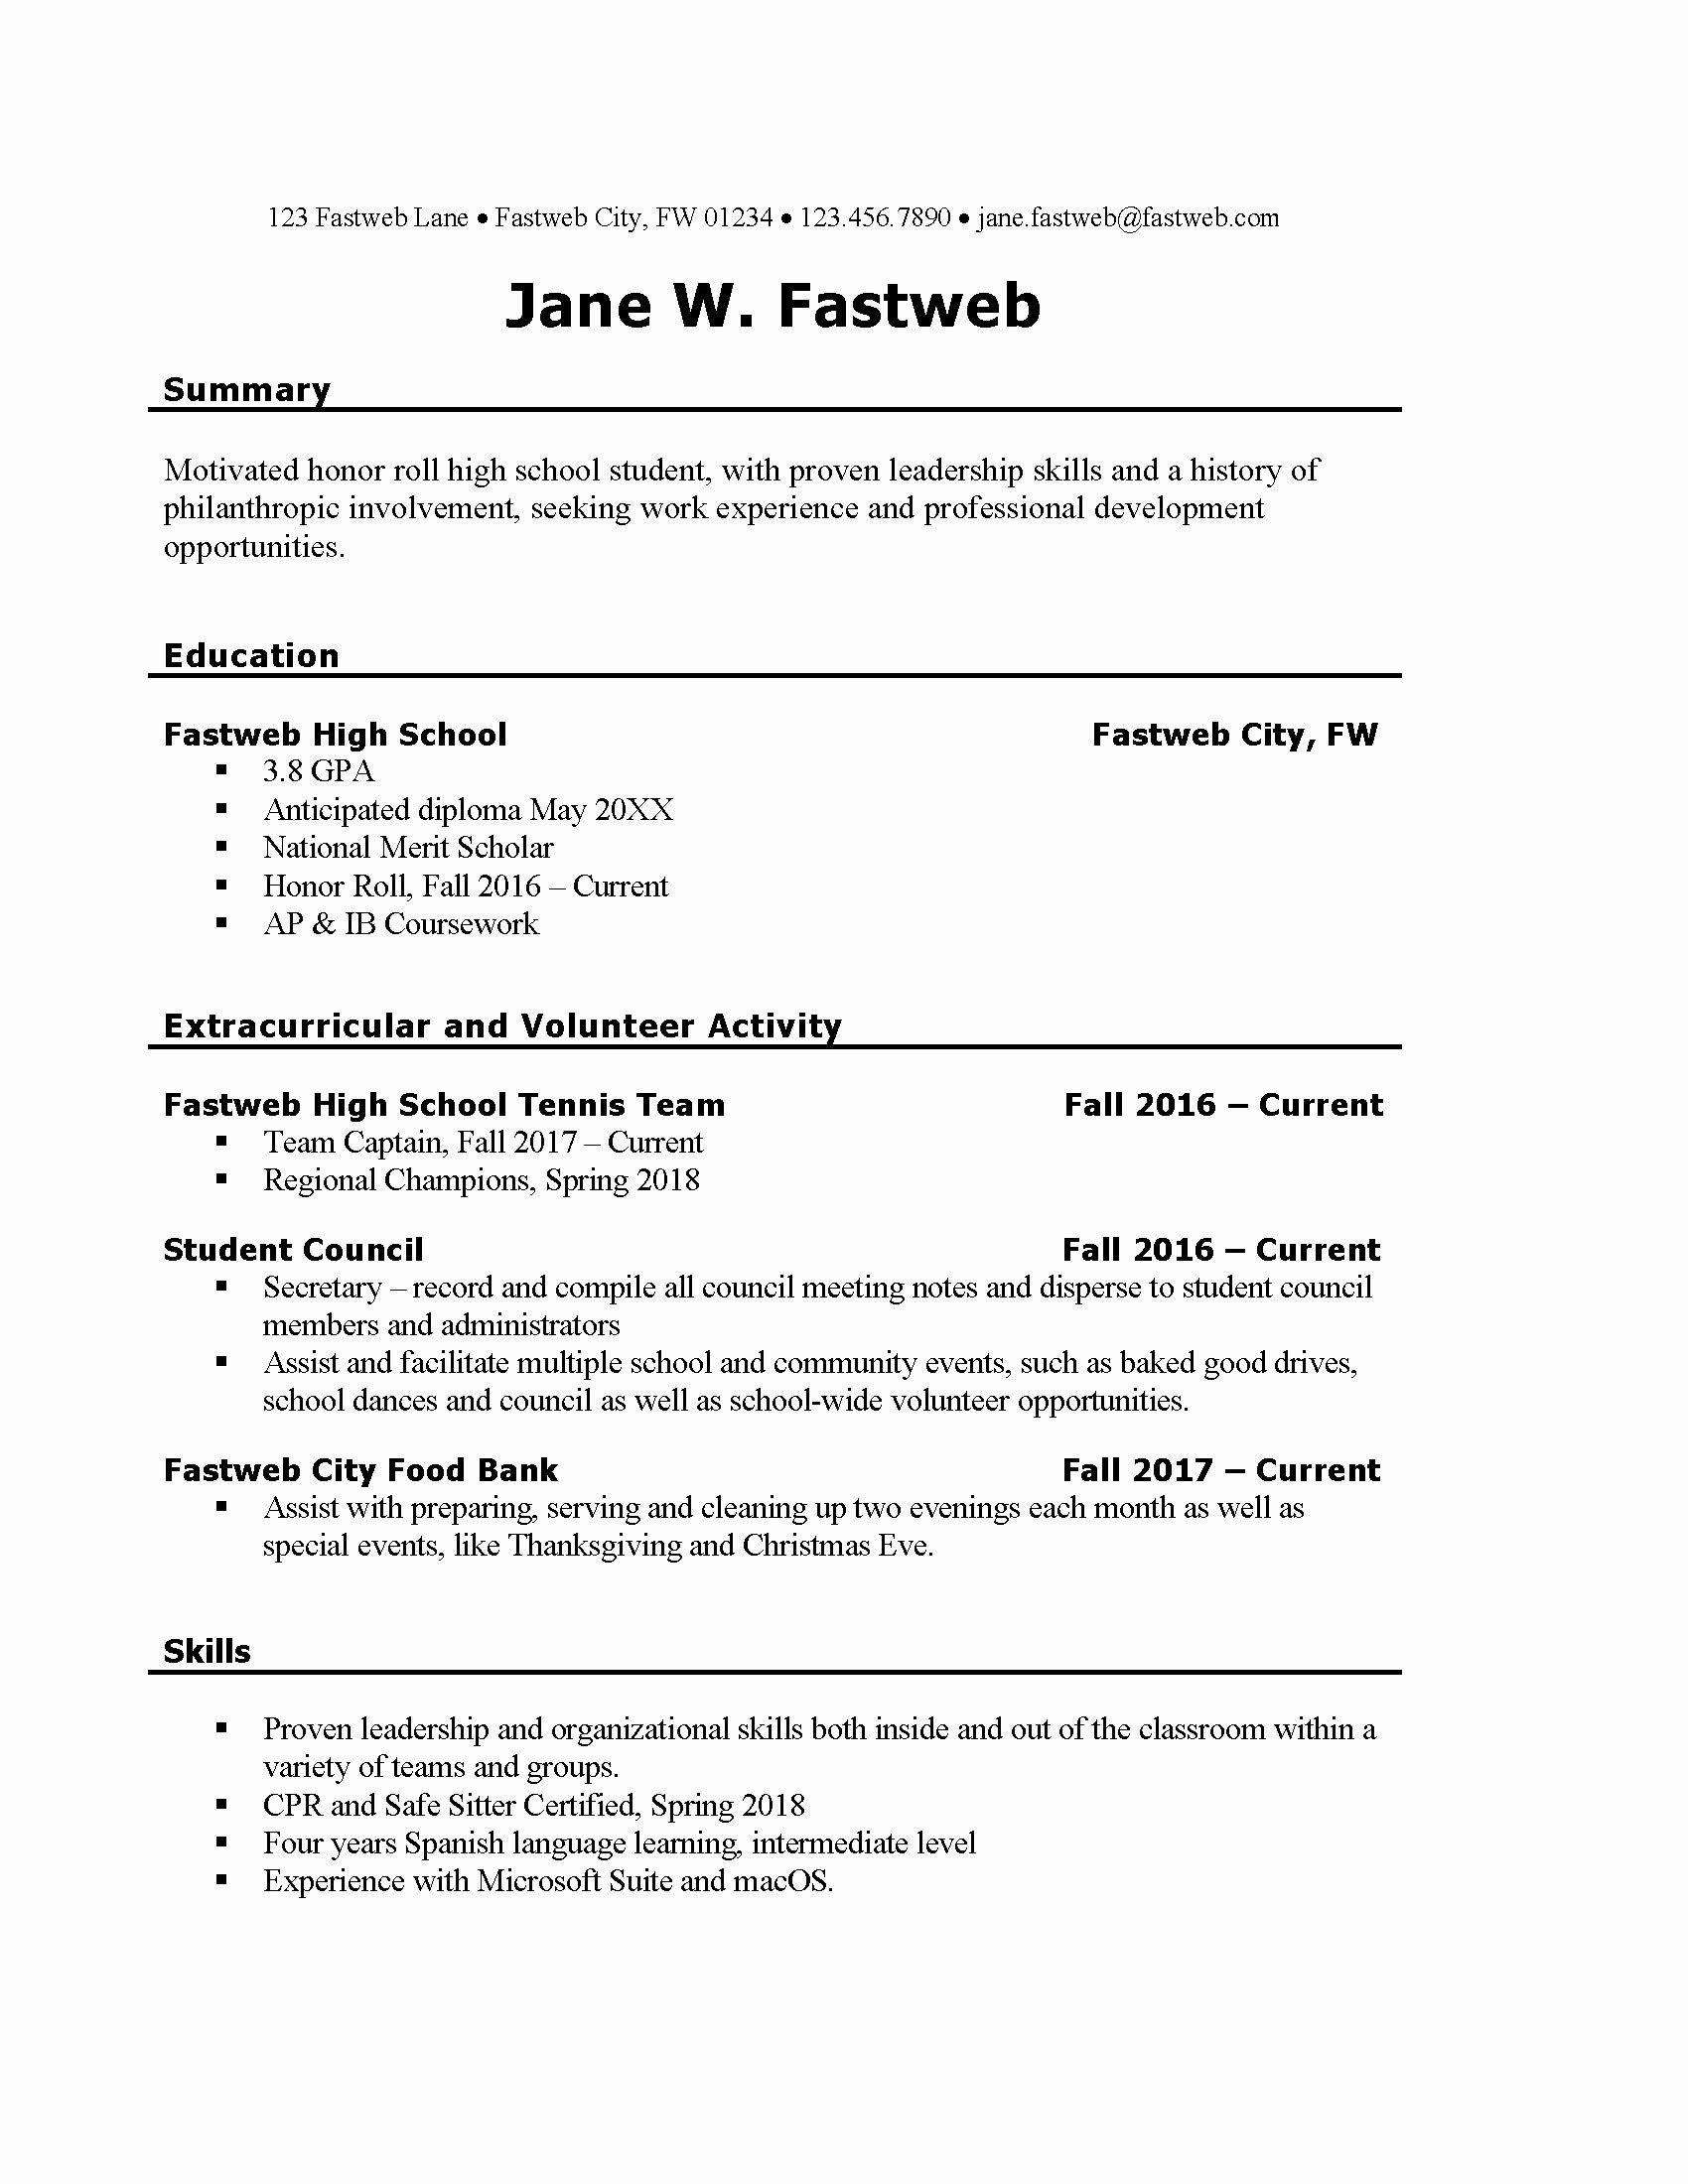 23 high school resume skills examples in 2020 job resume